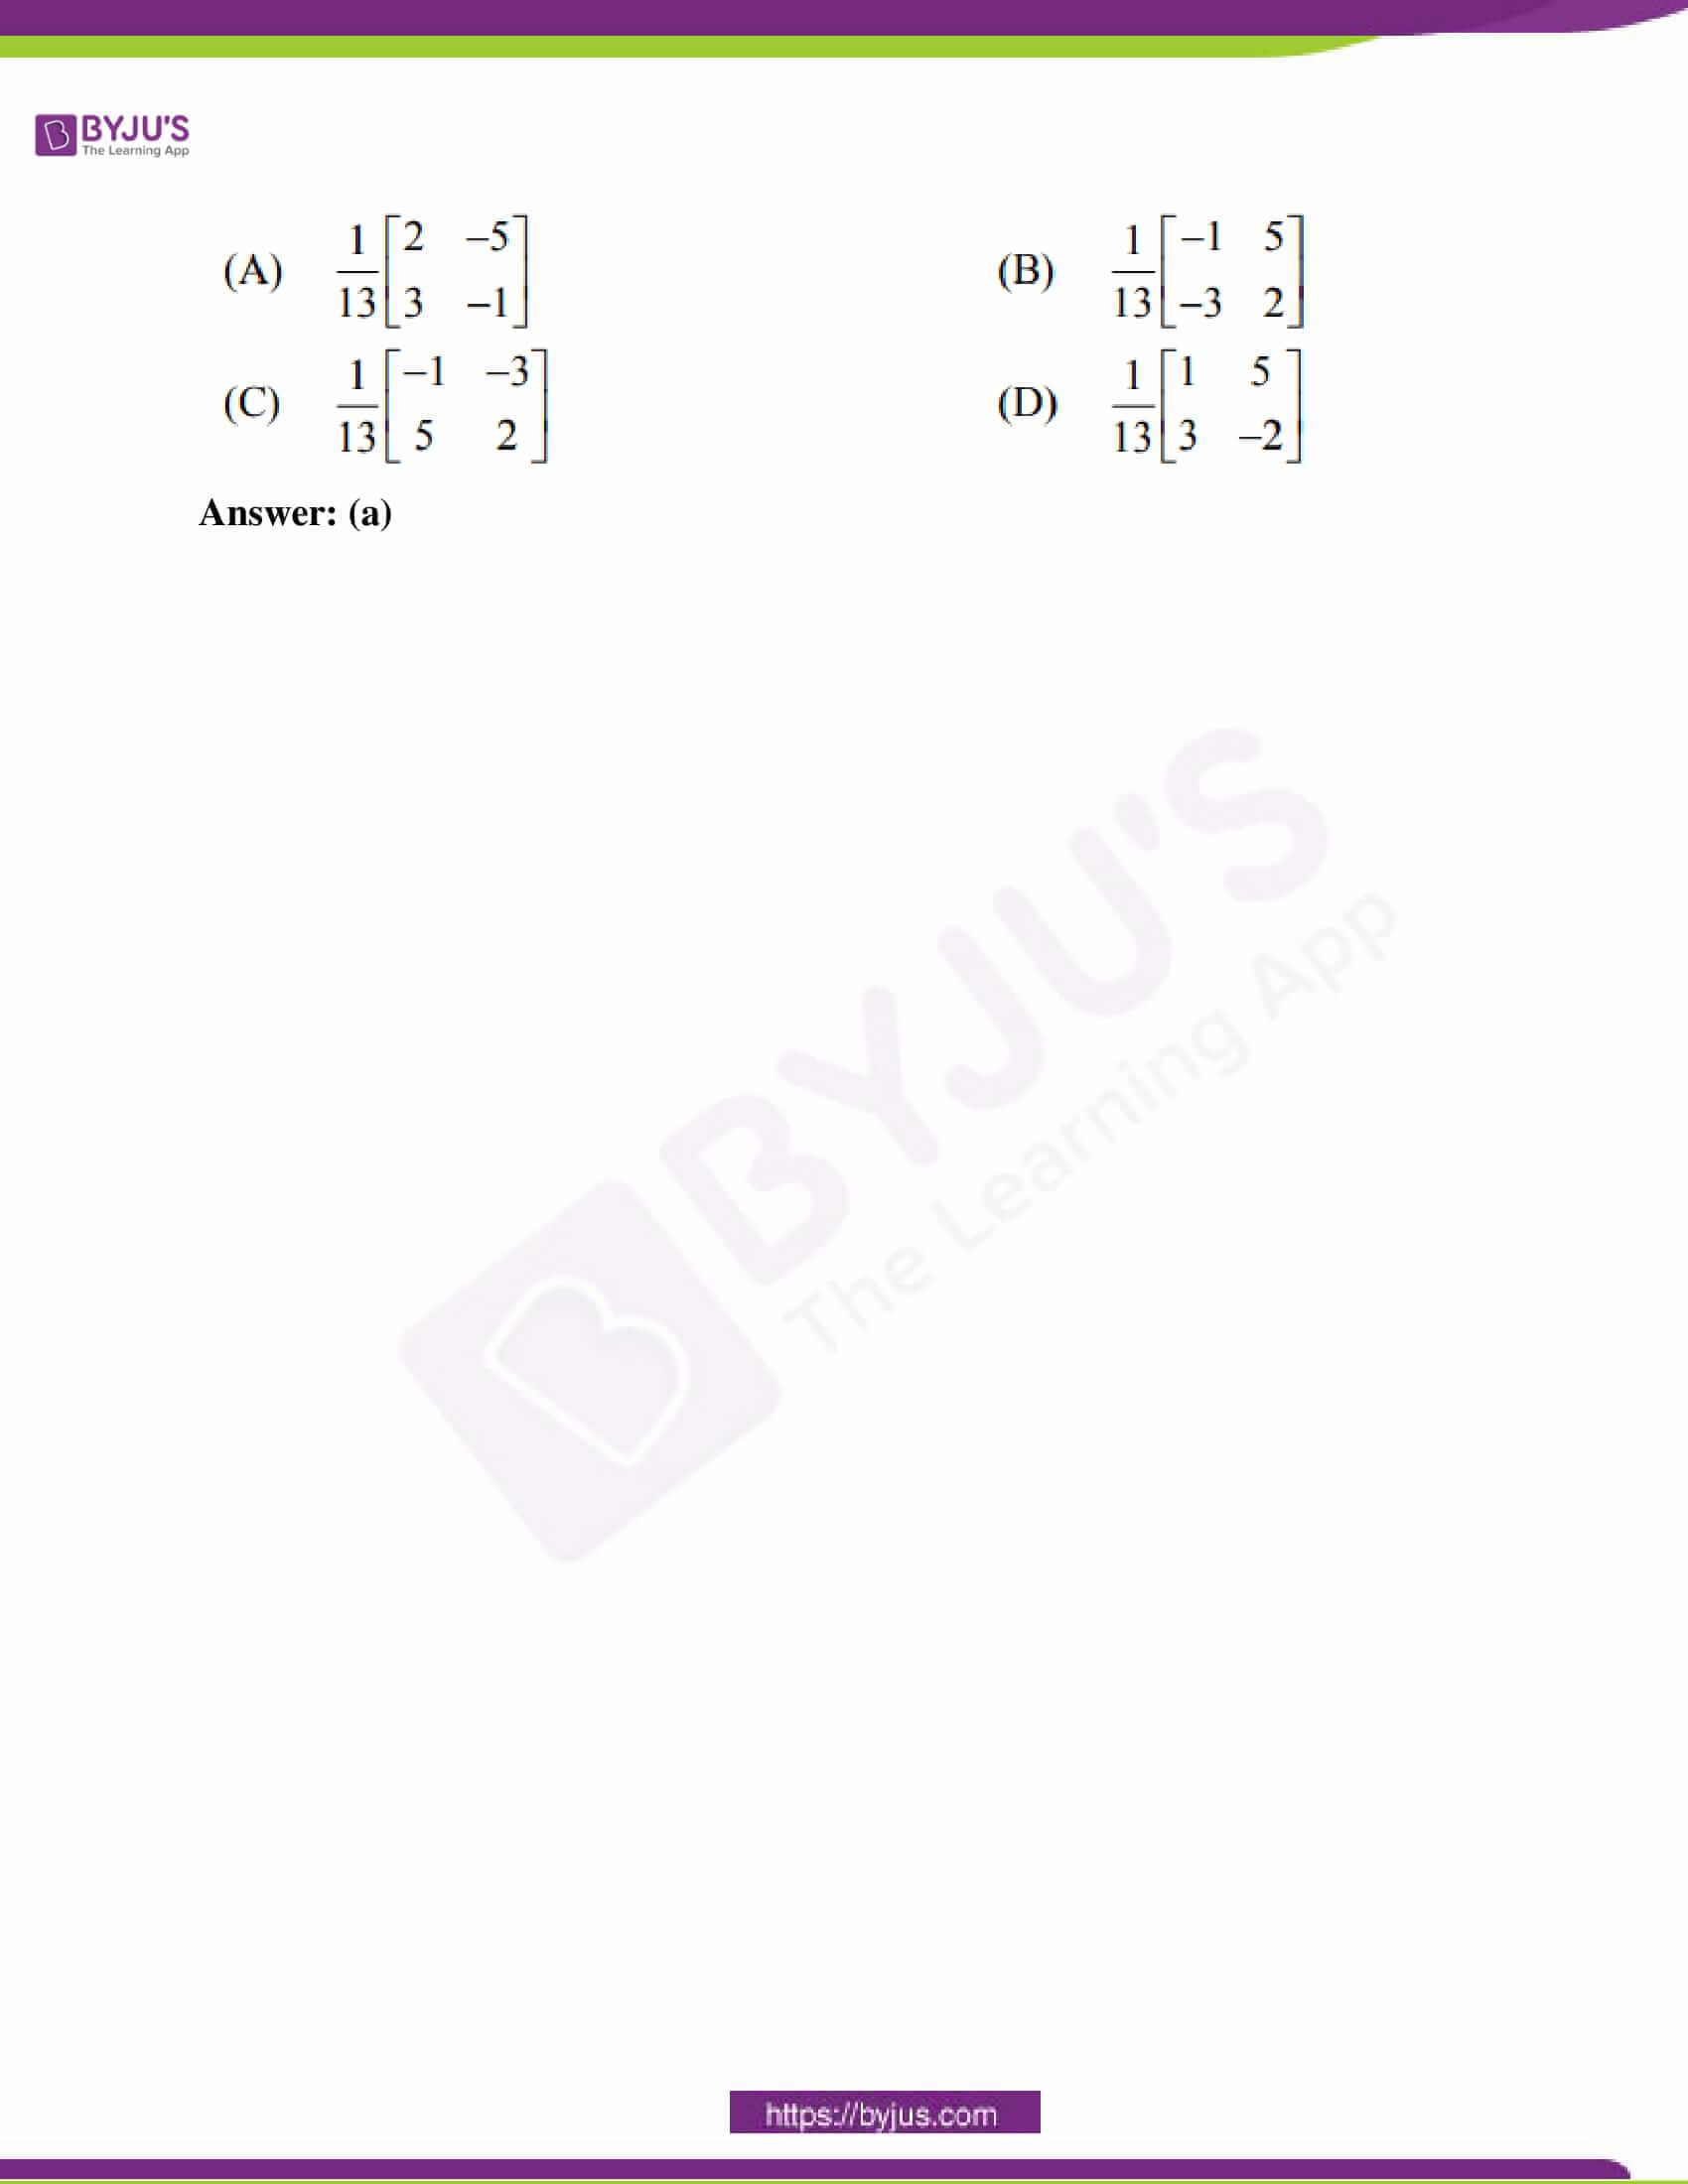 maharashtra class 12 exam question paper solutions march 2017 02